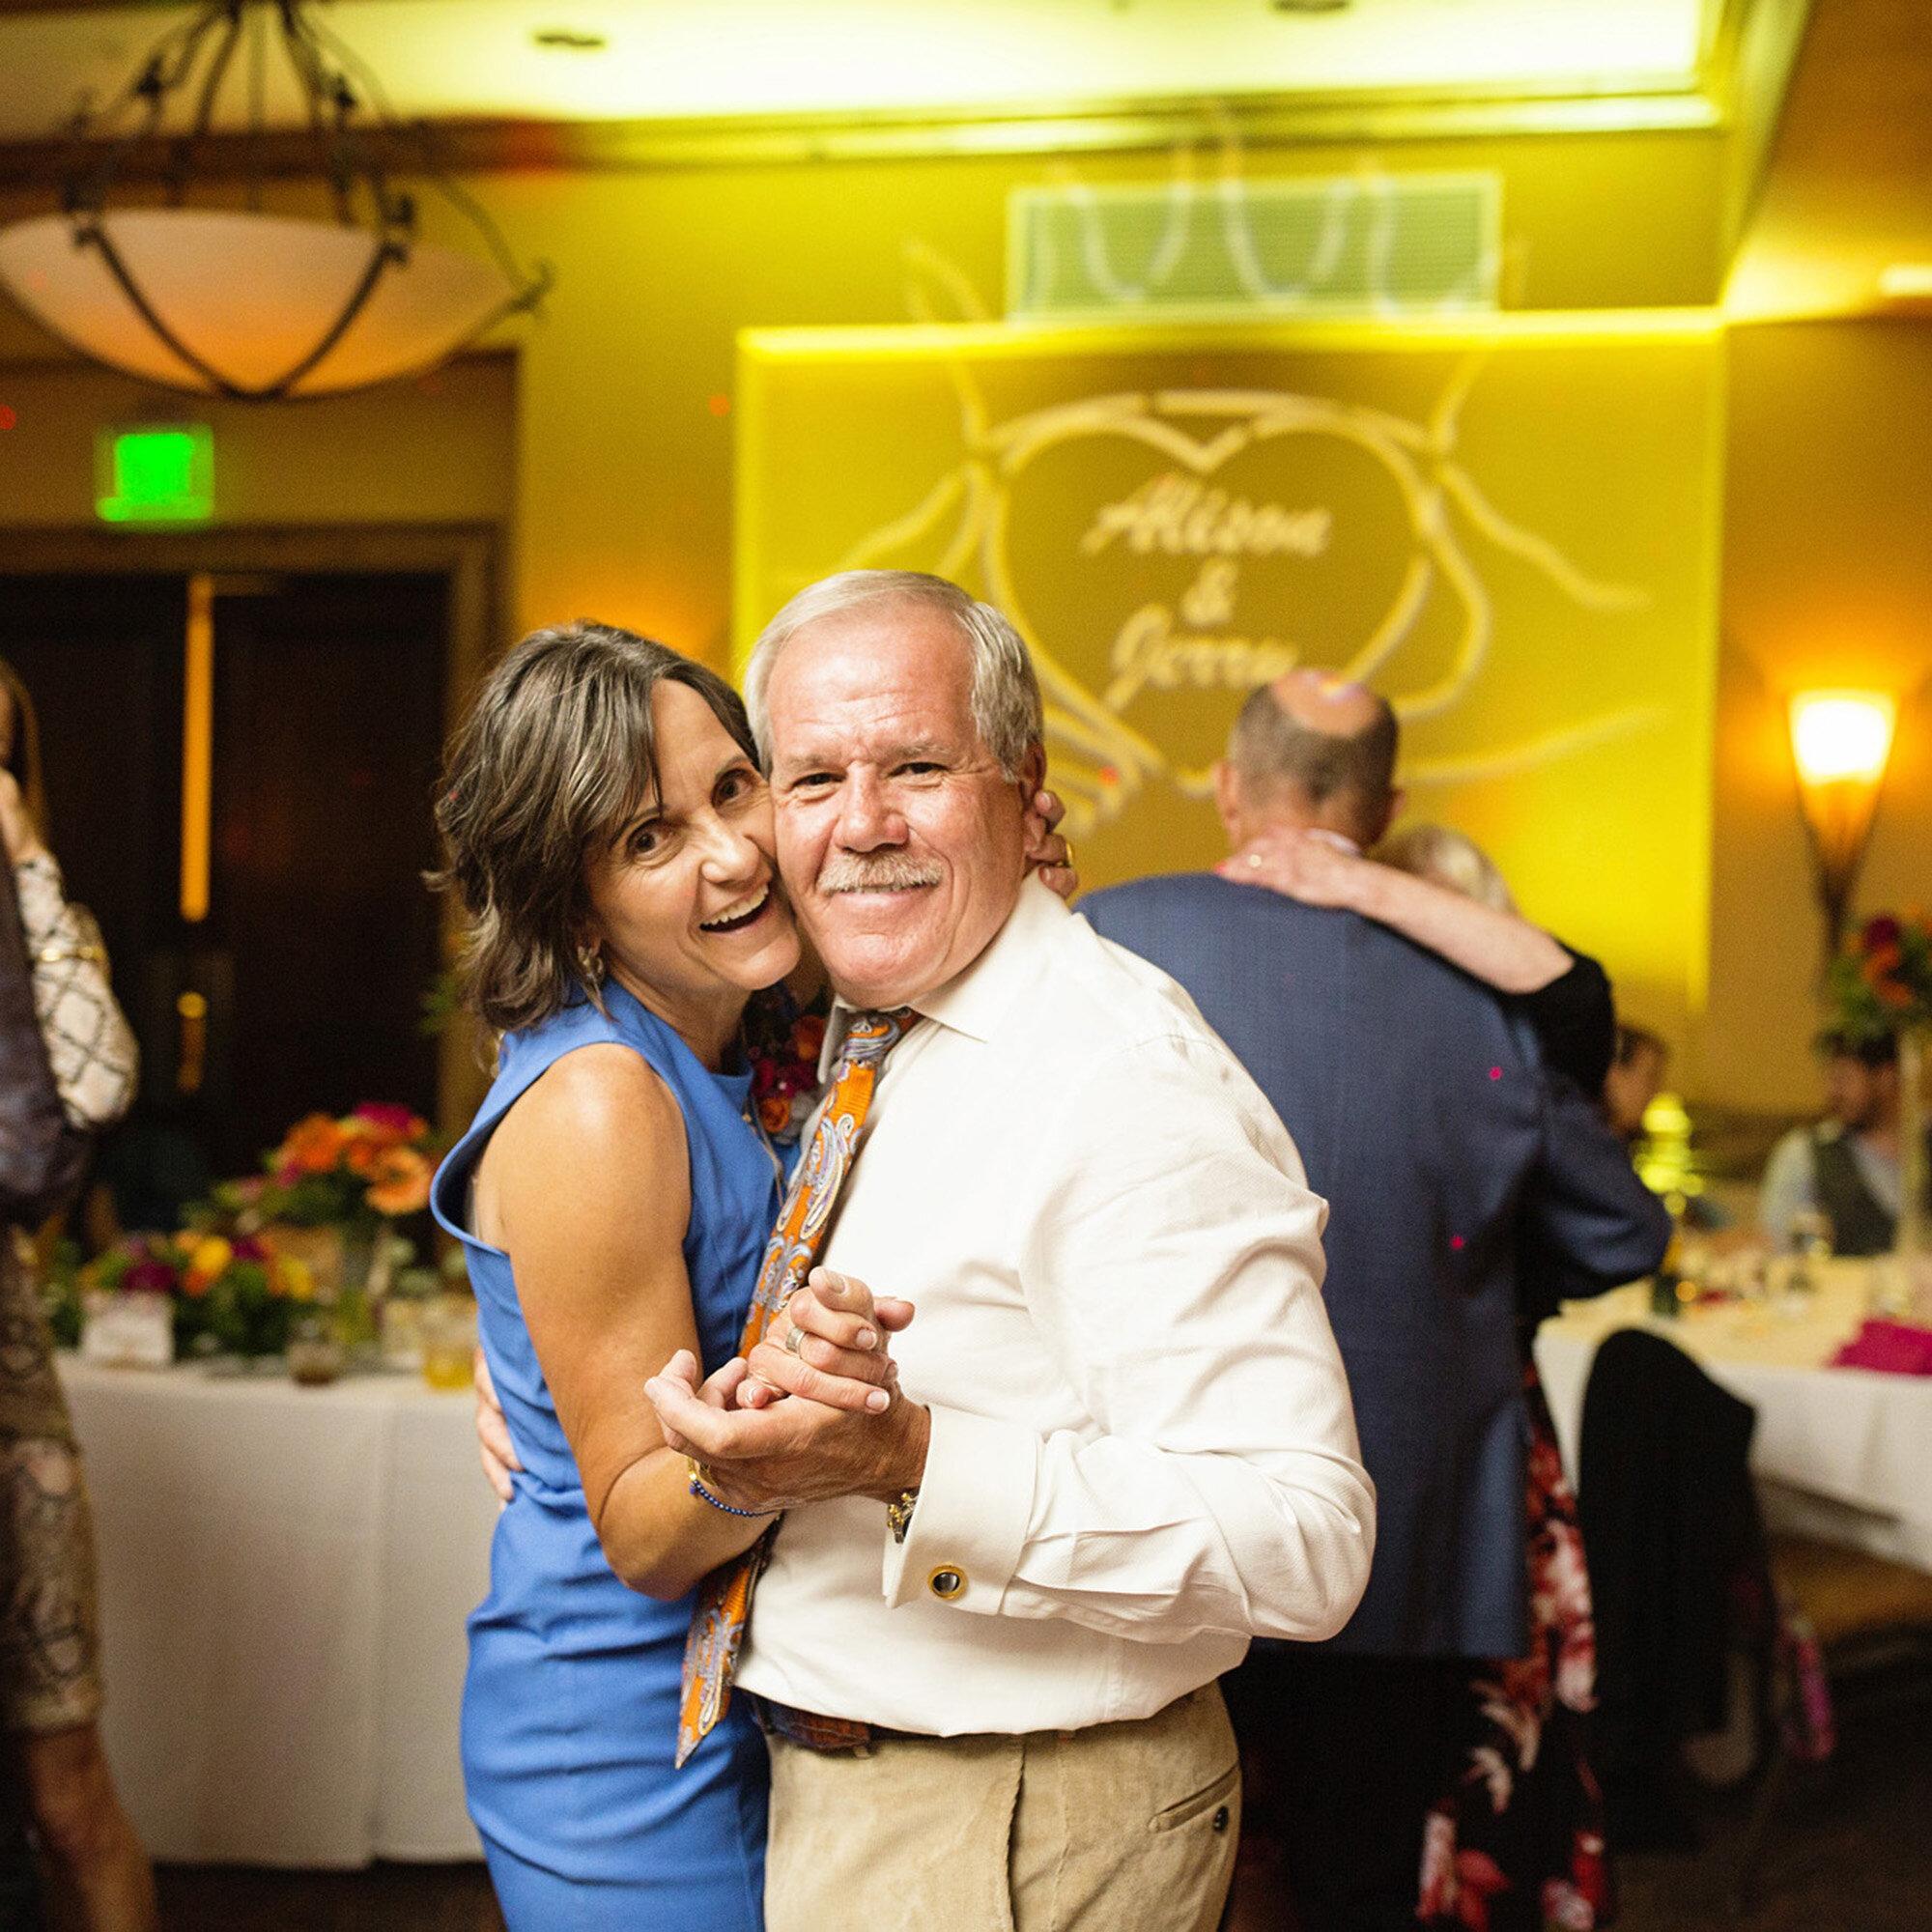 Seriously_Sabrina_Photography_Colorado_Springs_Club_at_Flying_Horse_Destination_Wedding_ODwyer129.jpg